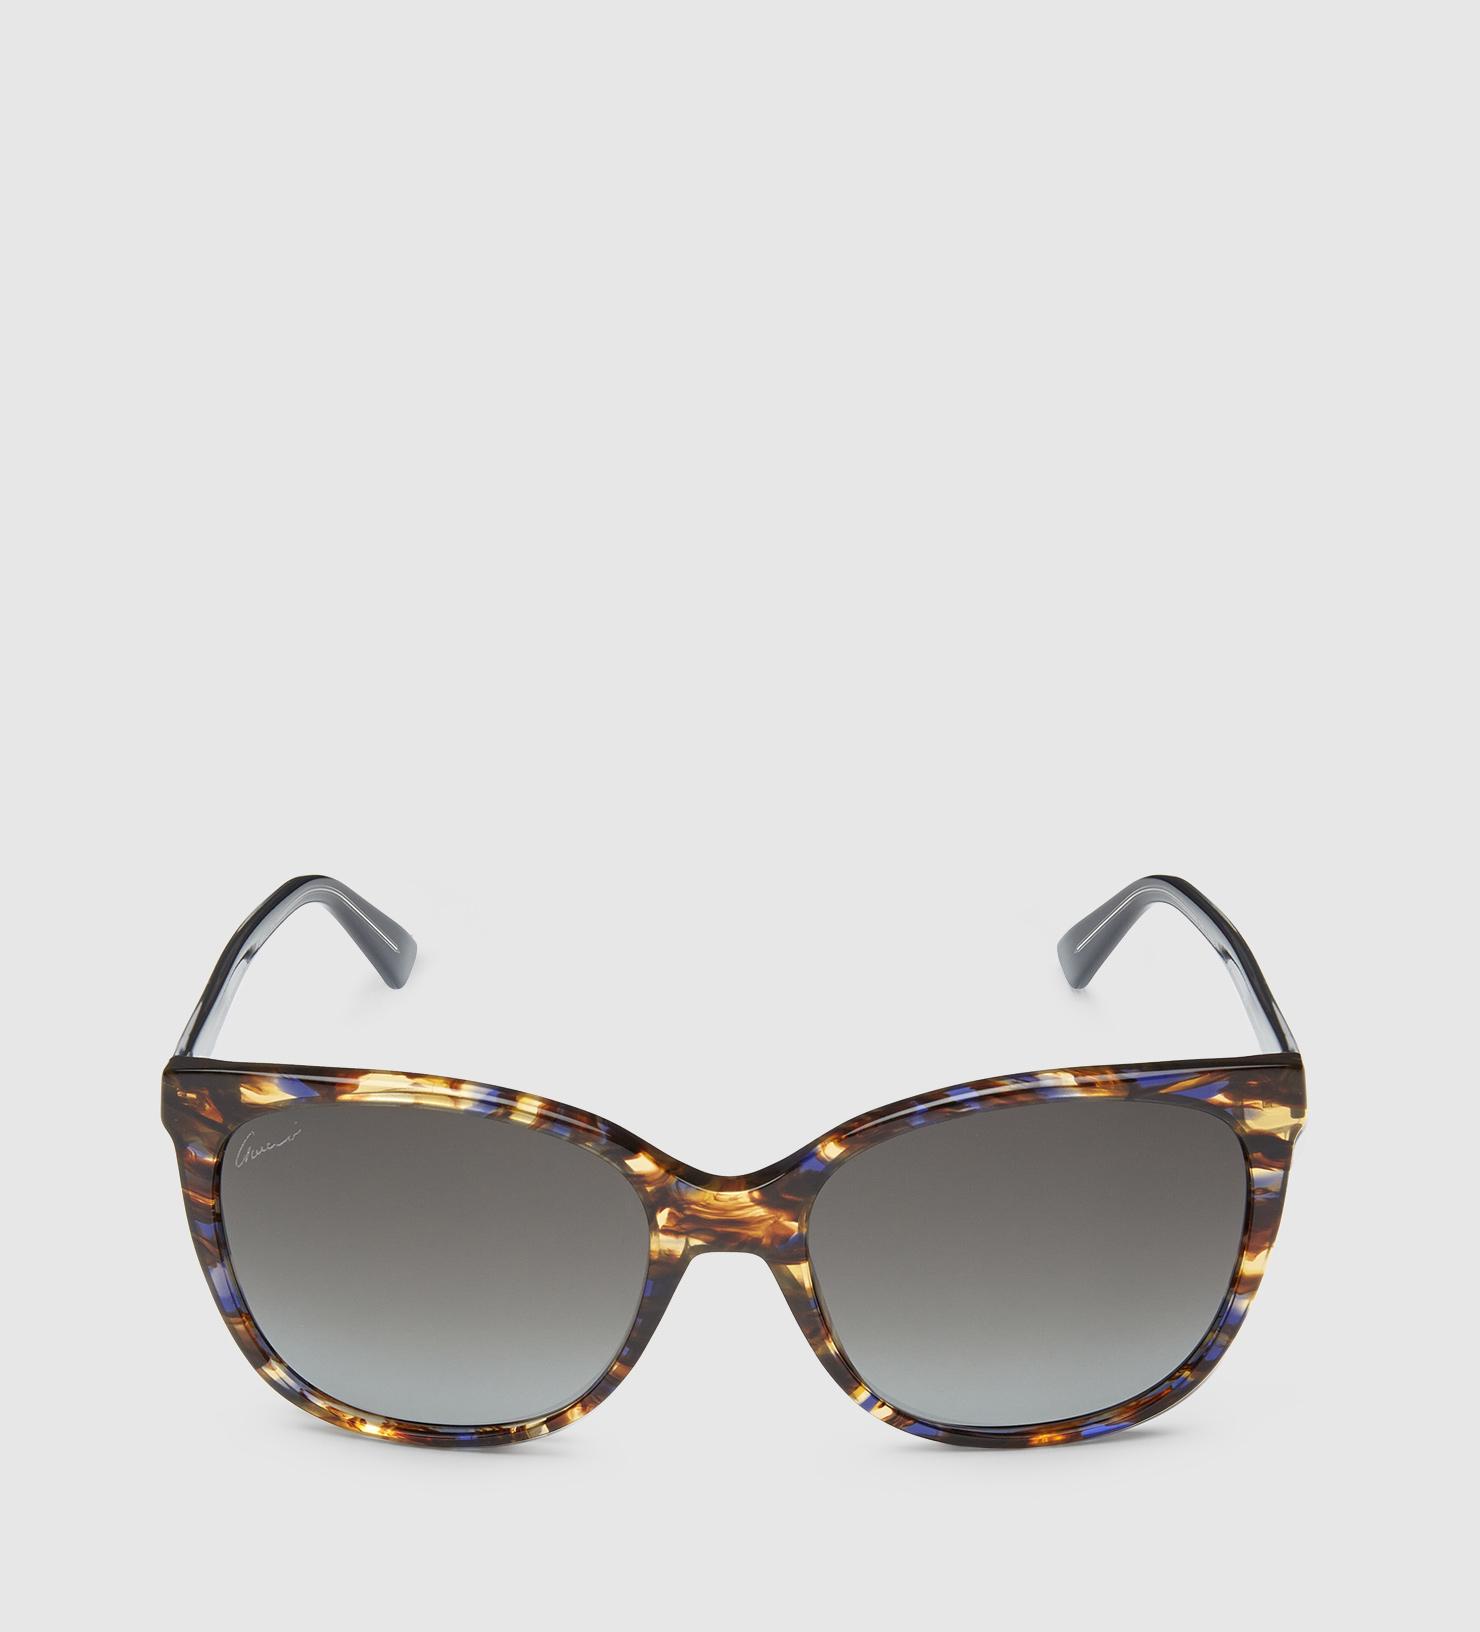 Gucci Havana Light Acetate Sunglasses in Brown Lyst